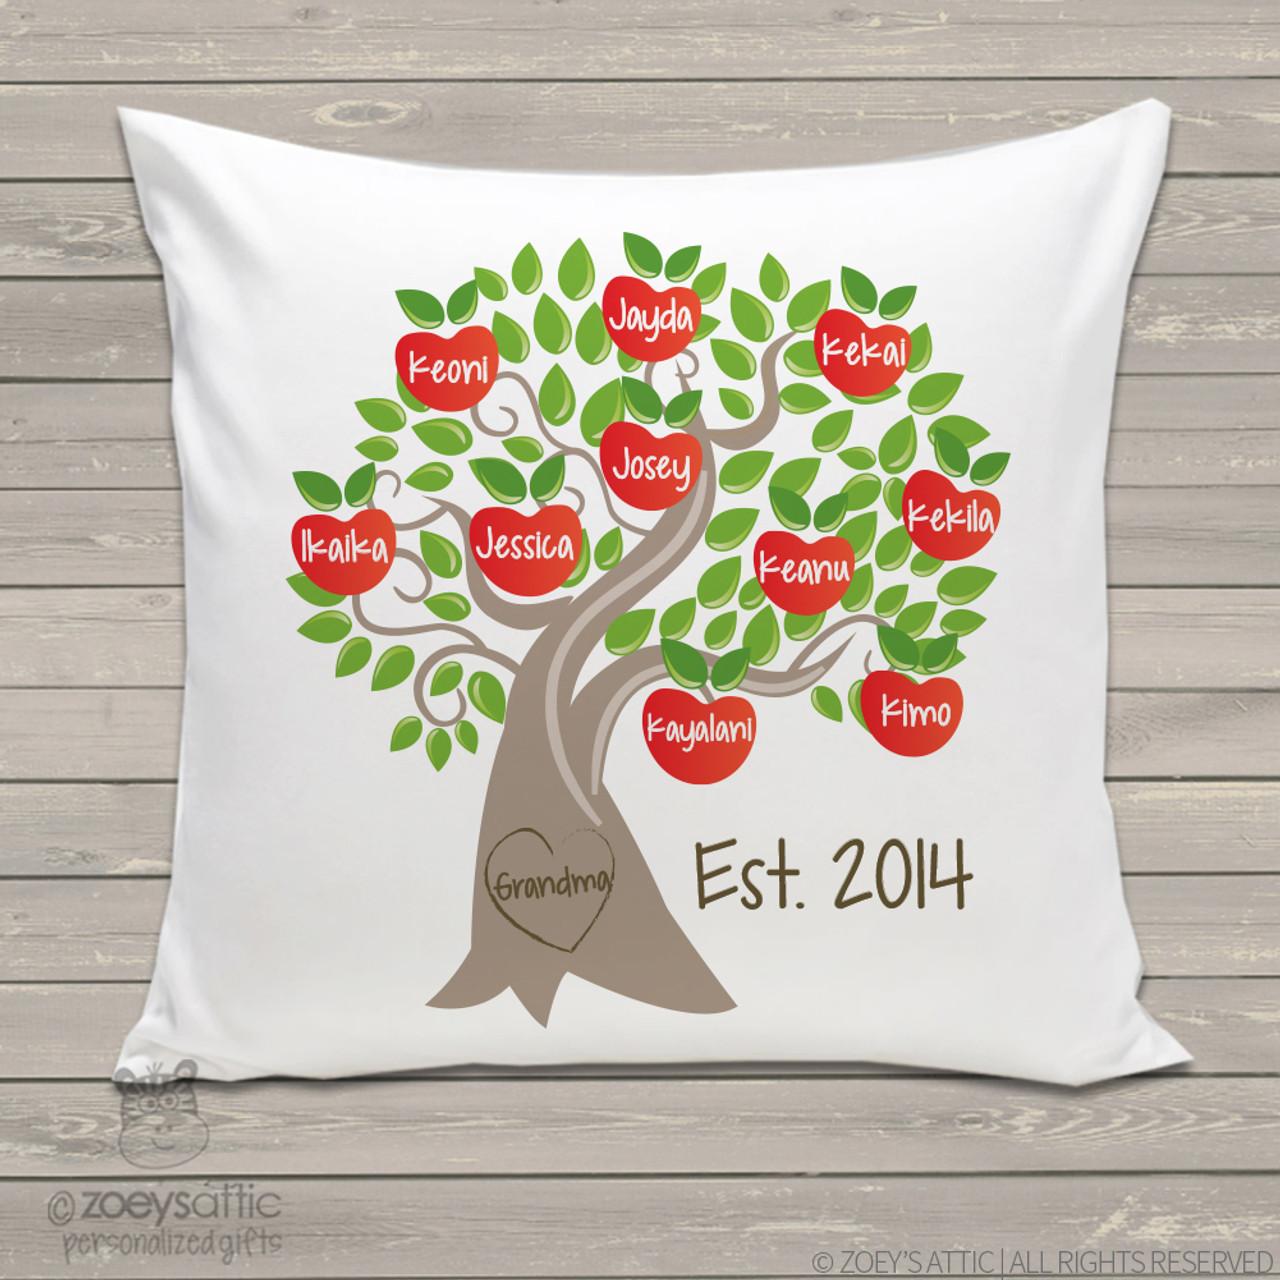 grandma family tree throw pillow custom personalized apple tree pillowcase with pillow insert